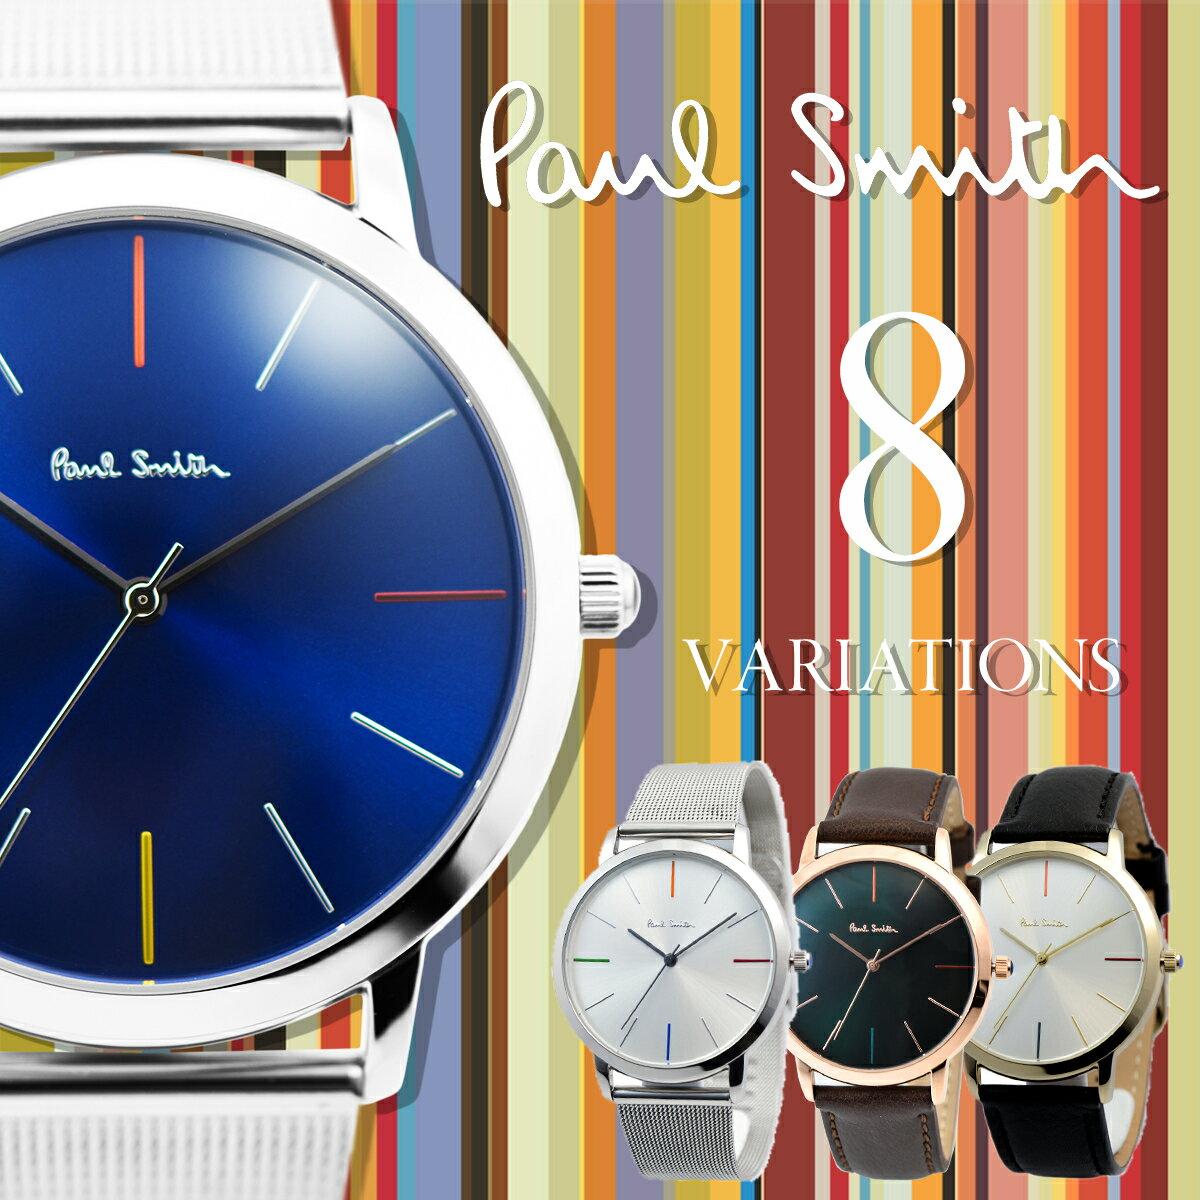 Paul Smith ポールスミス MA エムエー 41mm メンズ 腕時計 レザー メタル ウォッチ プレゼント 贈り物 記念日 ギフト [あす楽]